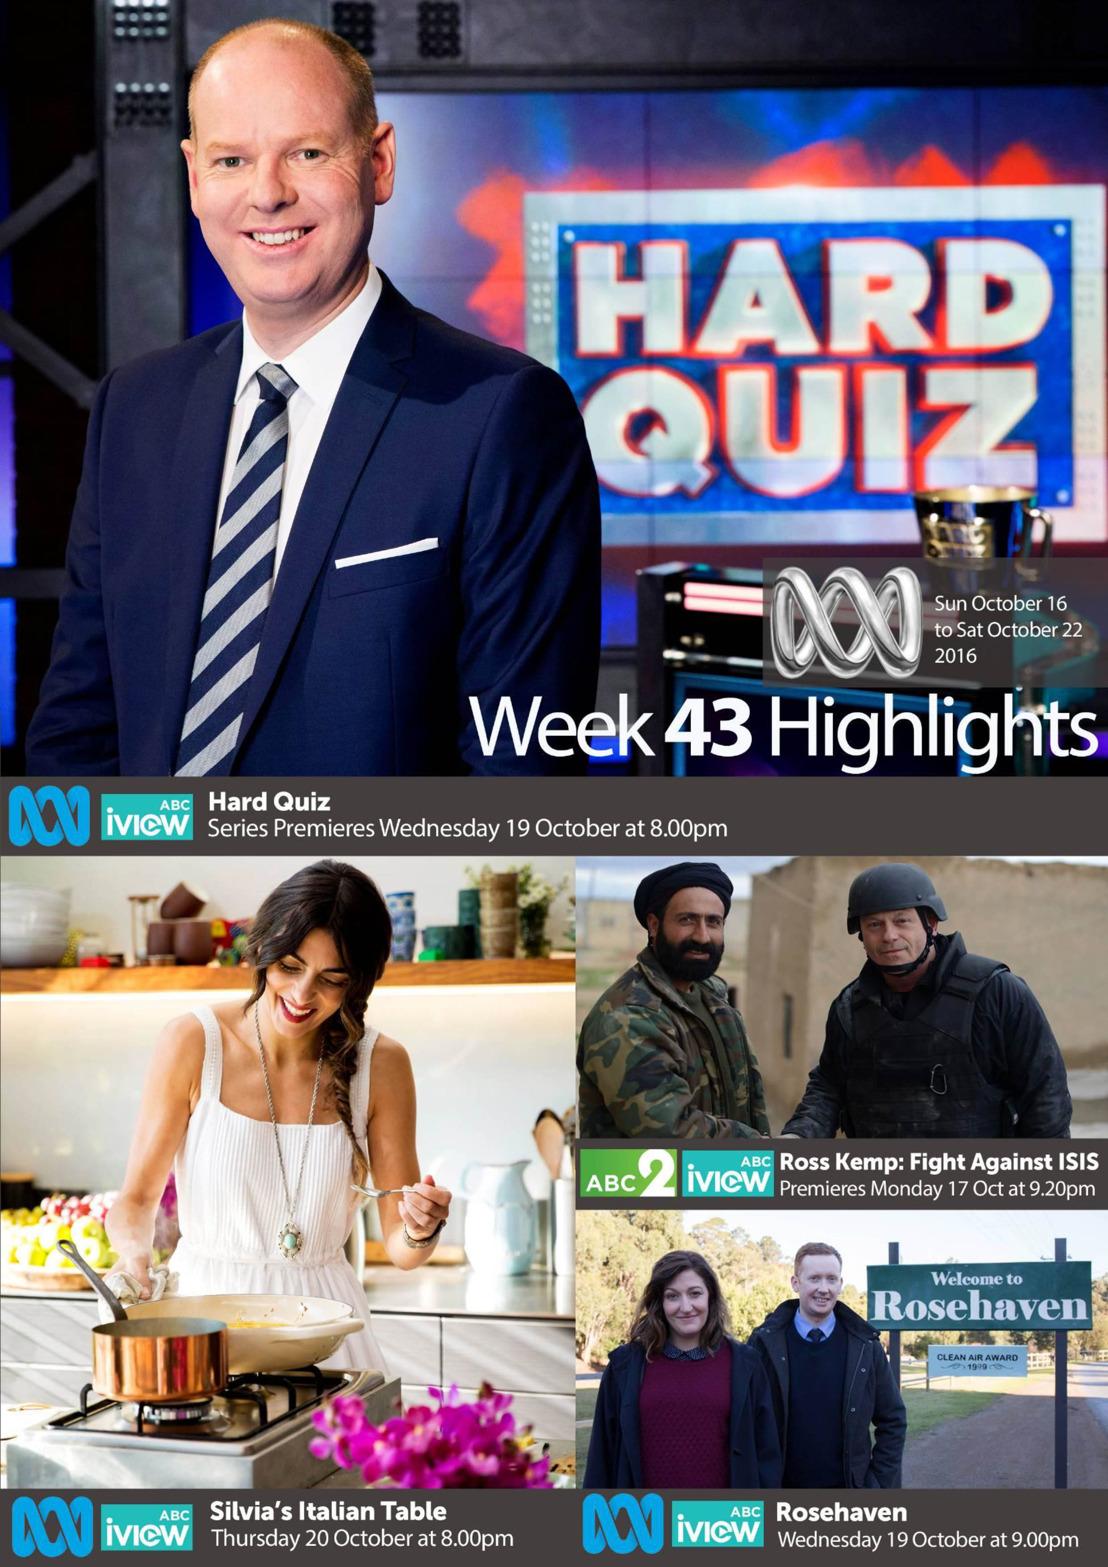 ABC Program Highlights - Week 43